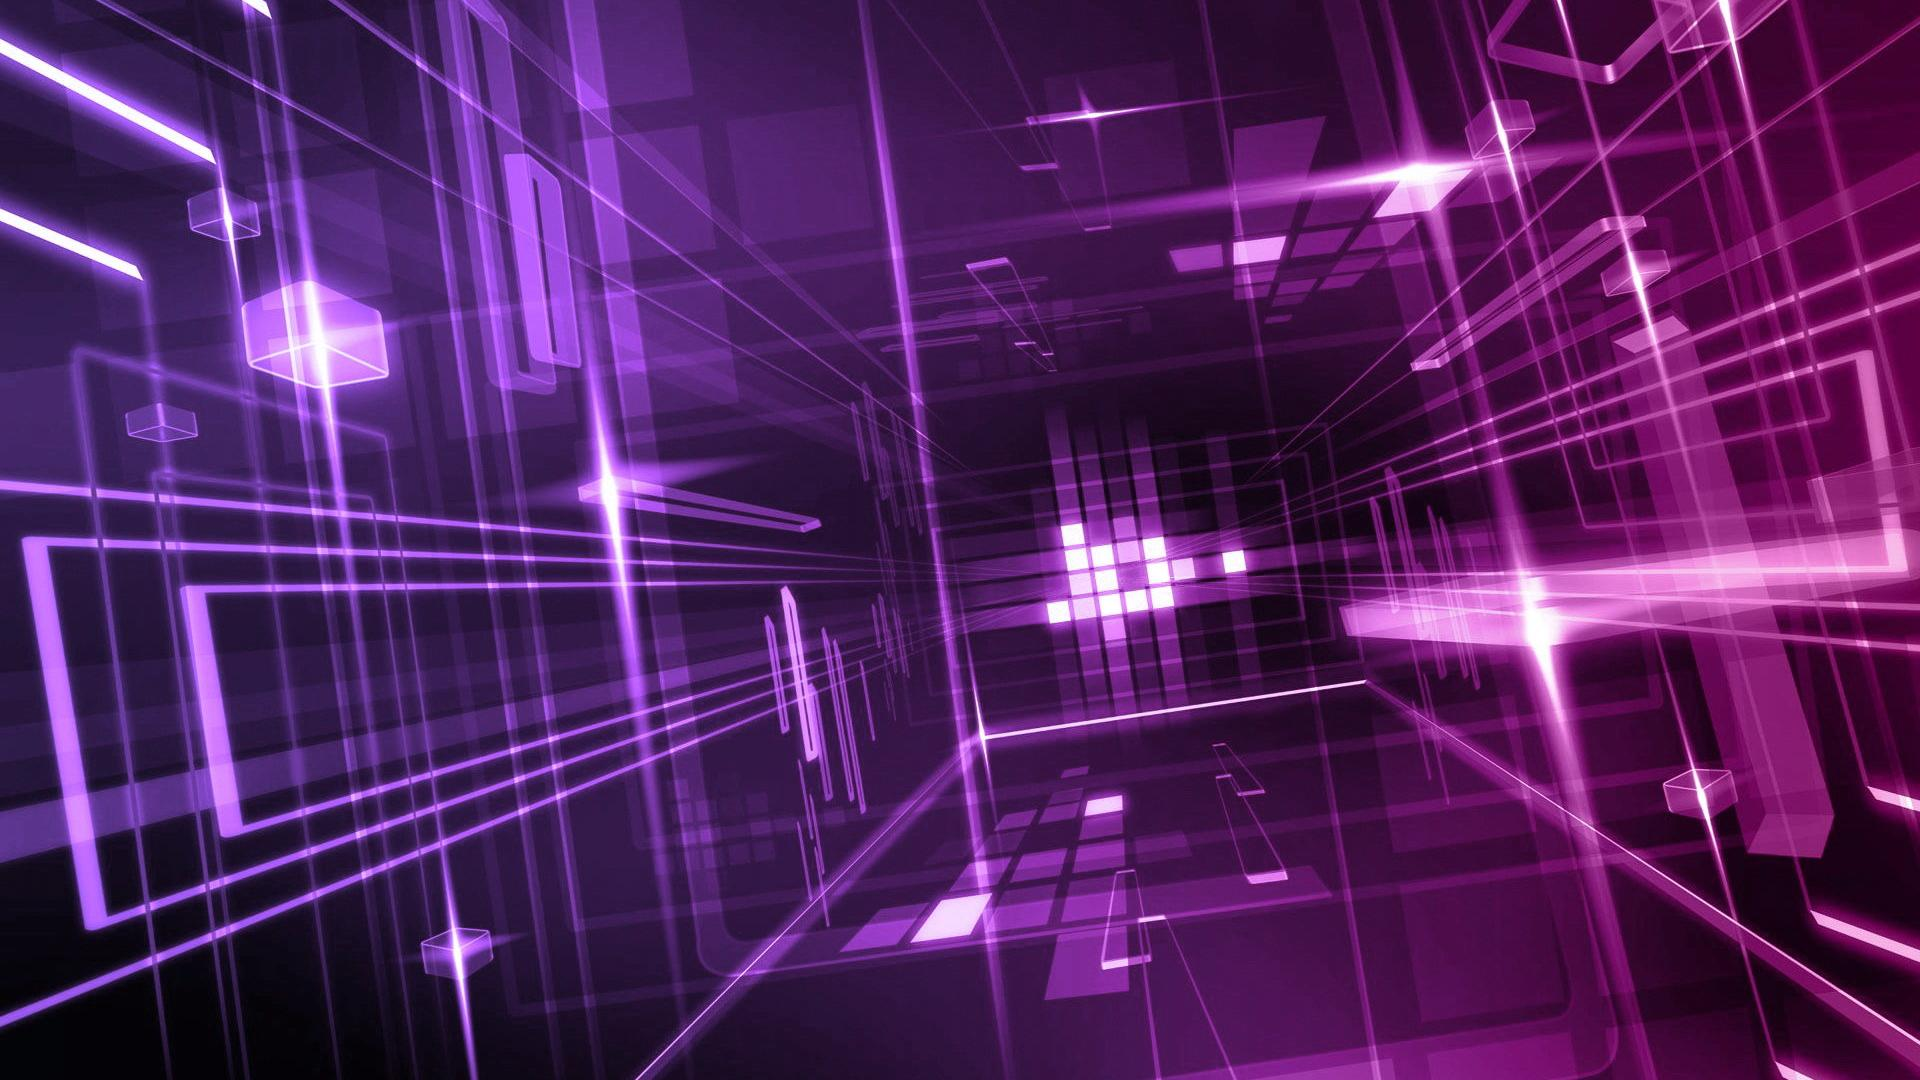 Cool 3D Wallpaper Purple Design